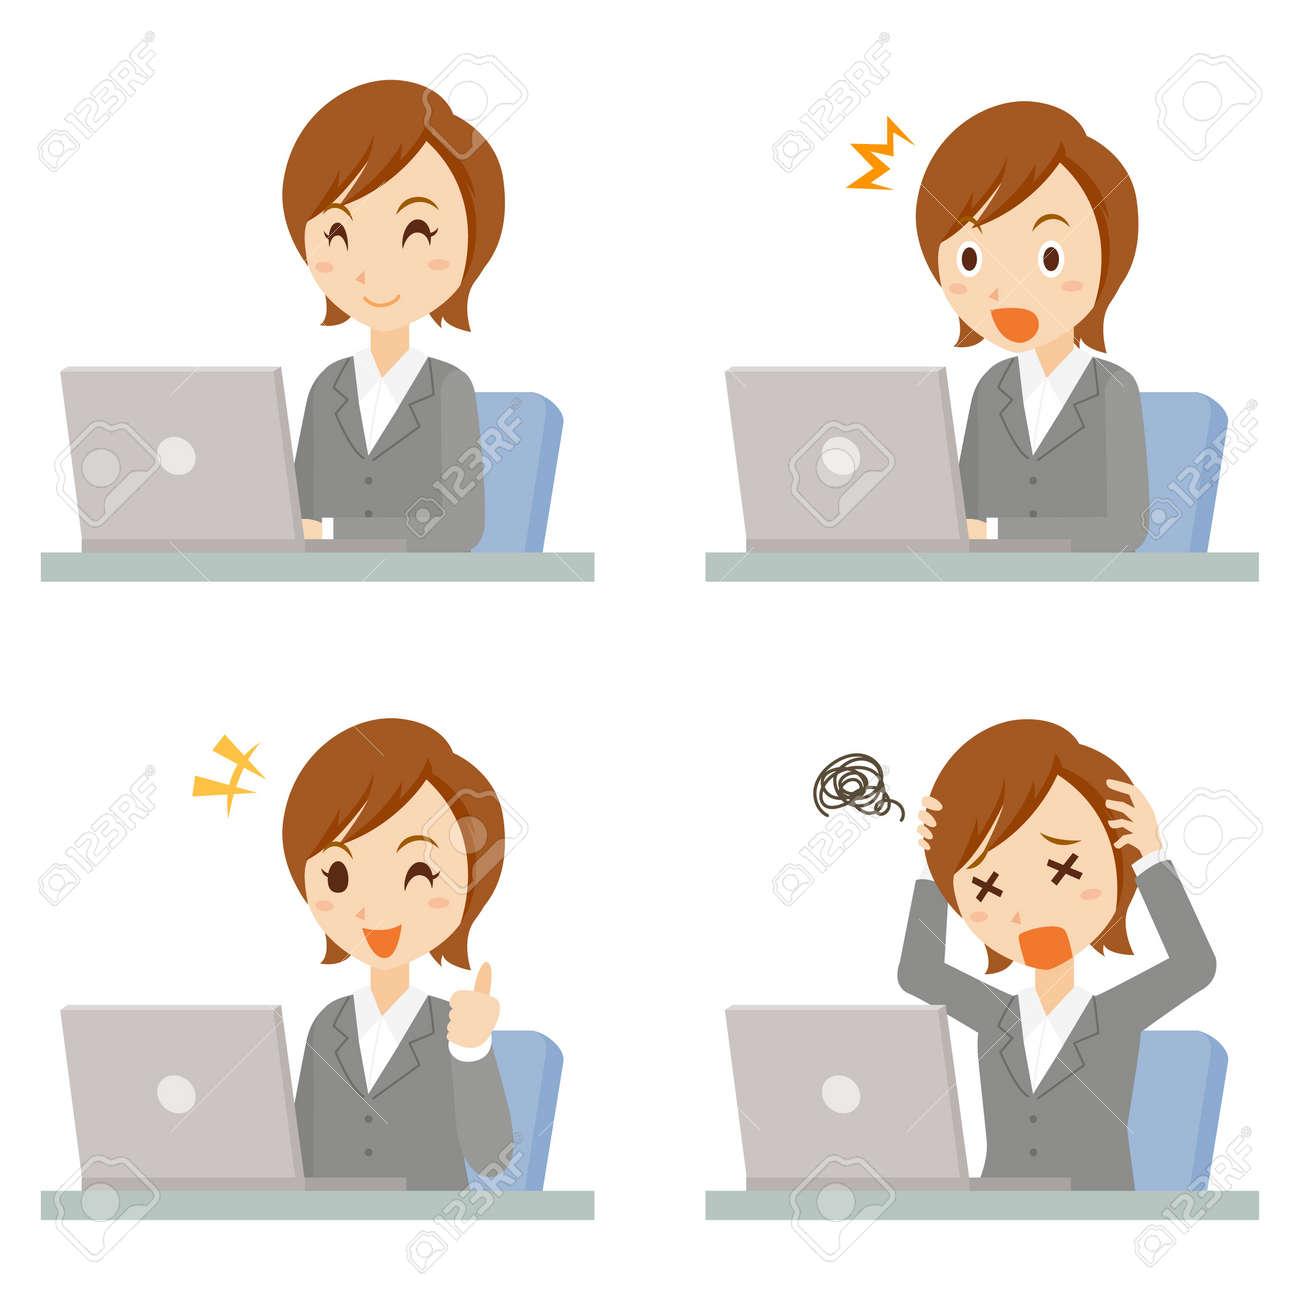 Women Business PC Pose Set - 168556971